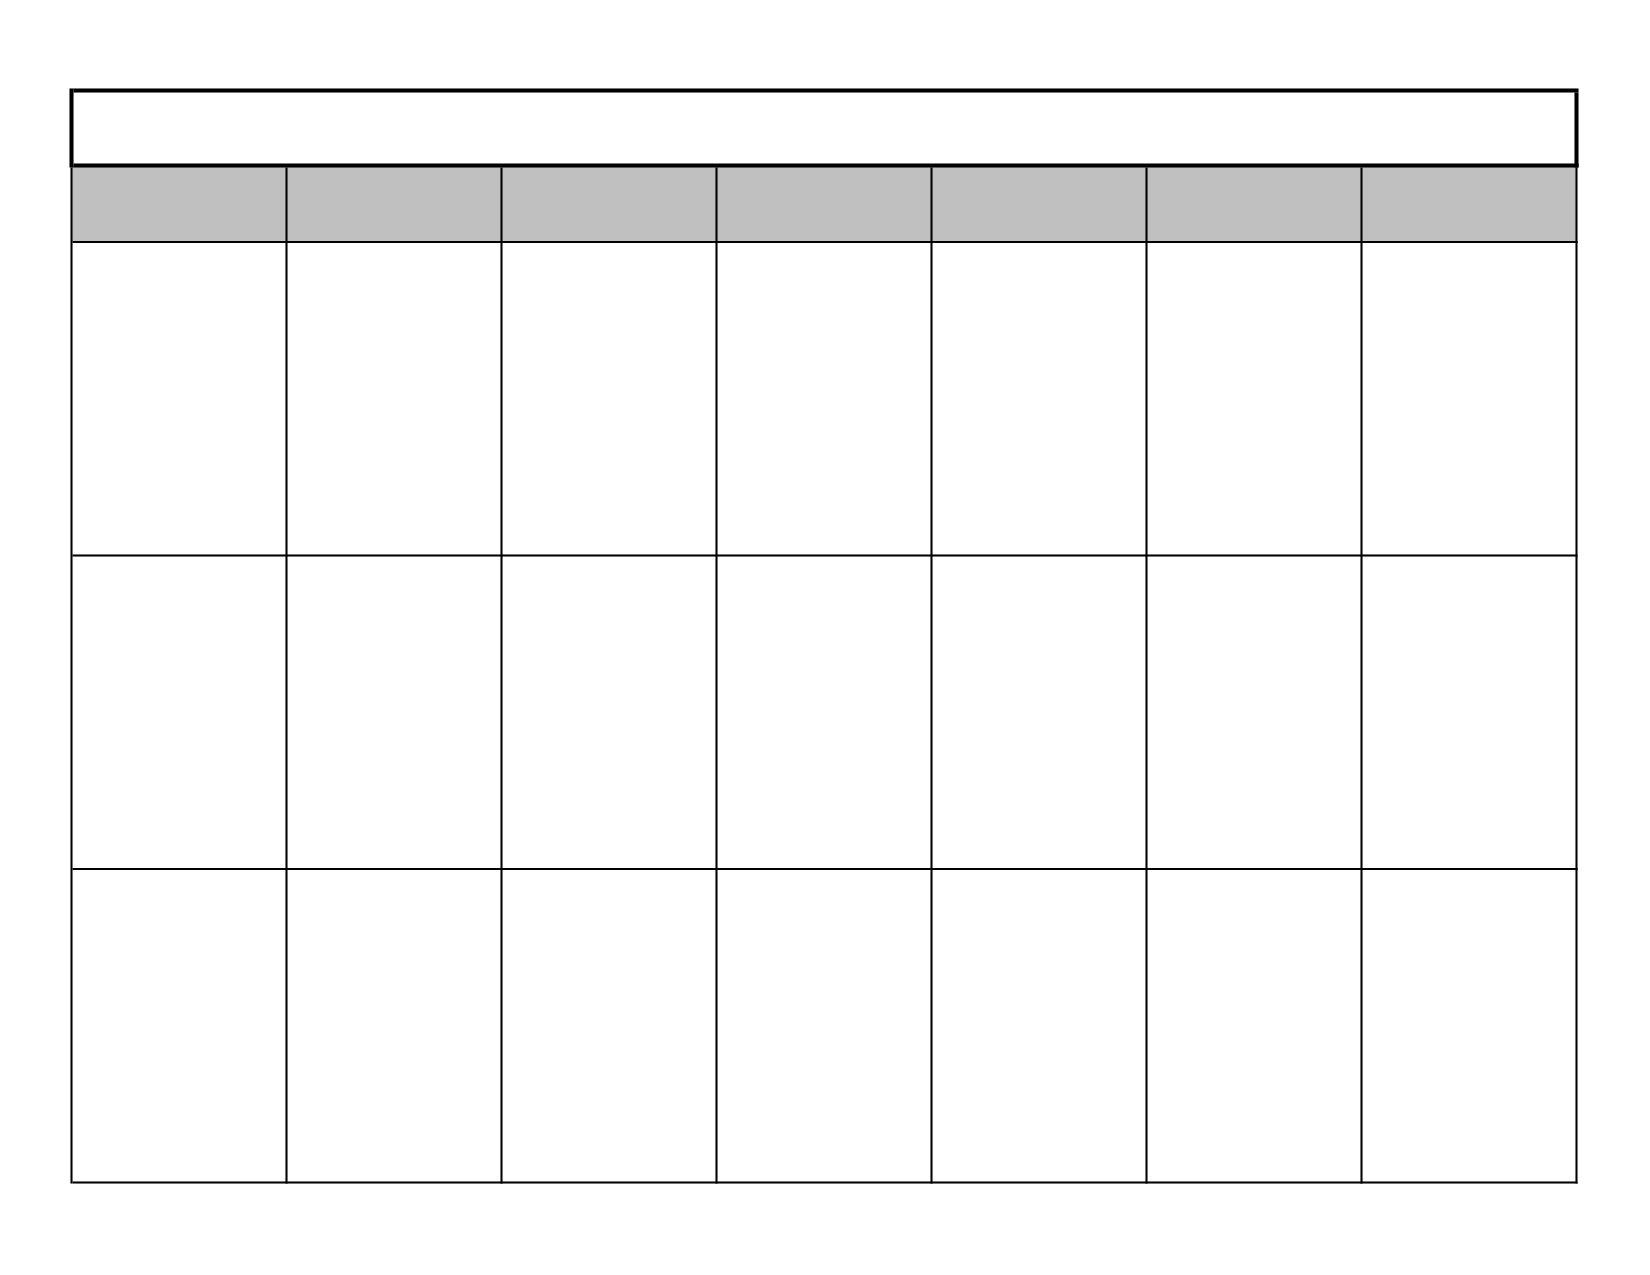 3 Week Calendar - Grude.interpretomics.co Make It | Blank ...